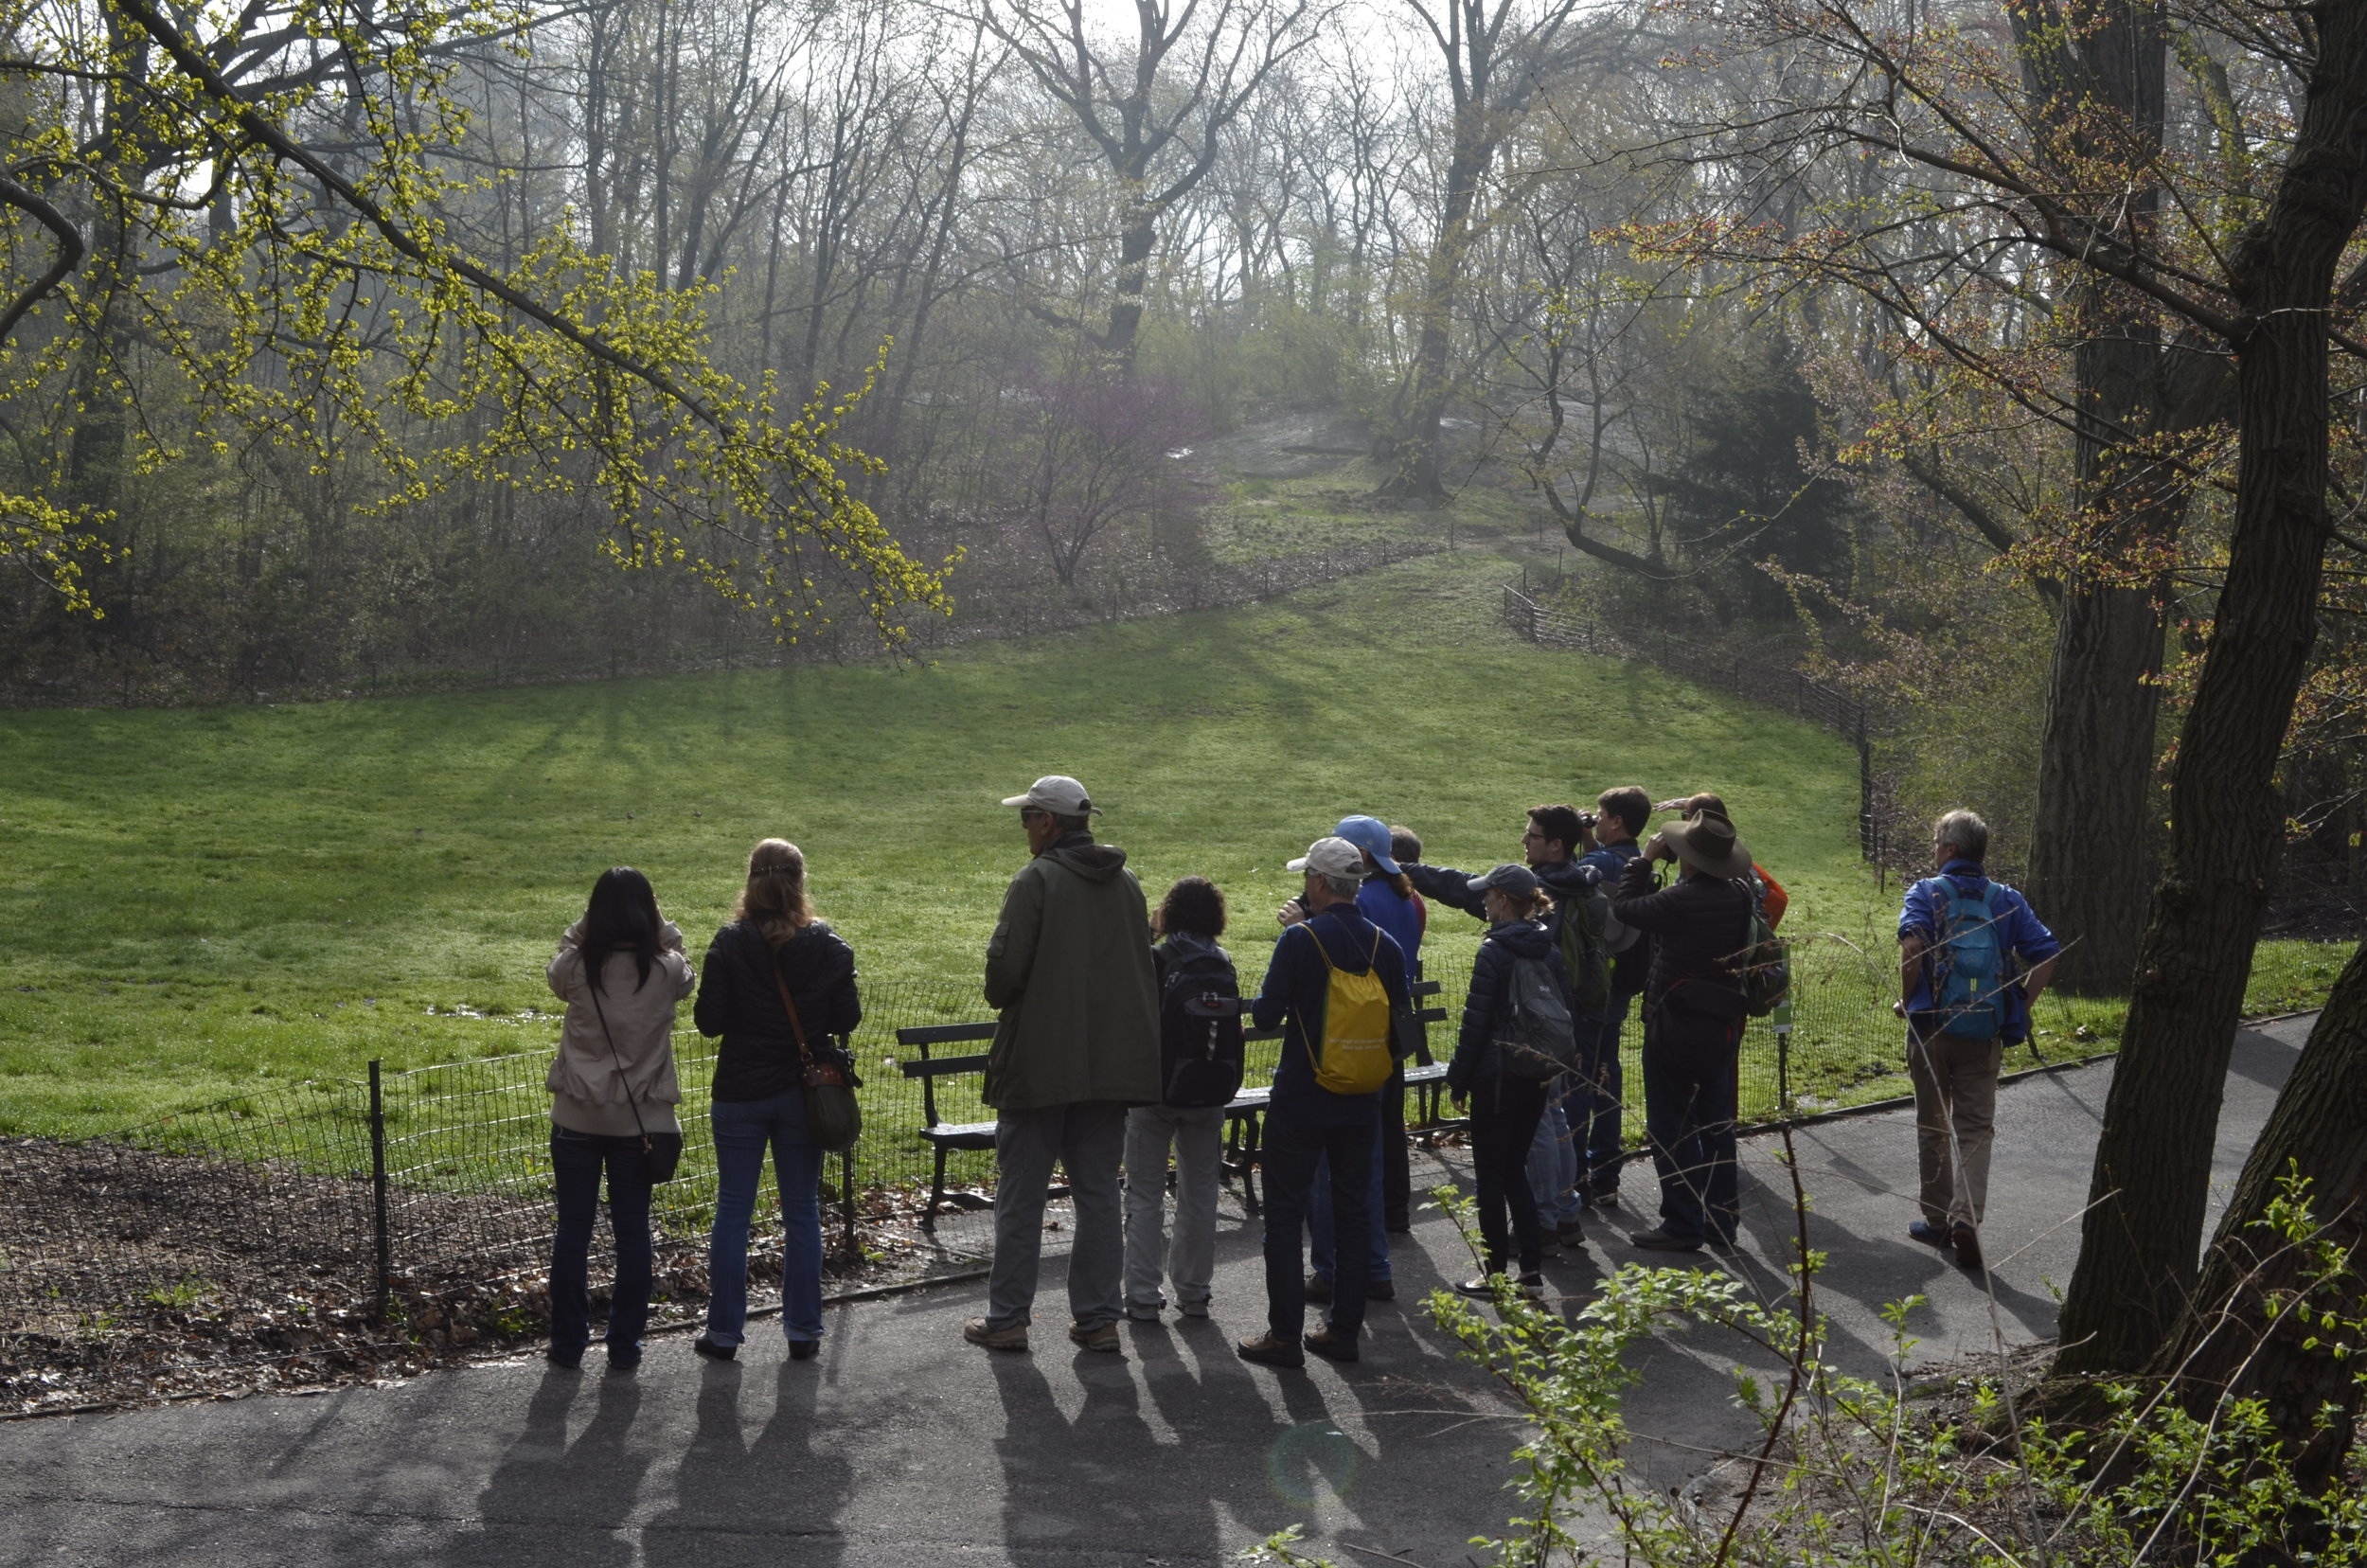 Spring Birding in Central Park with Spencer Galen - April 28